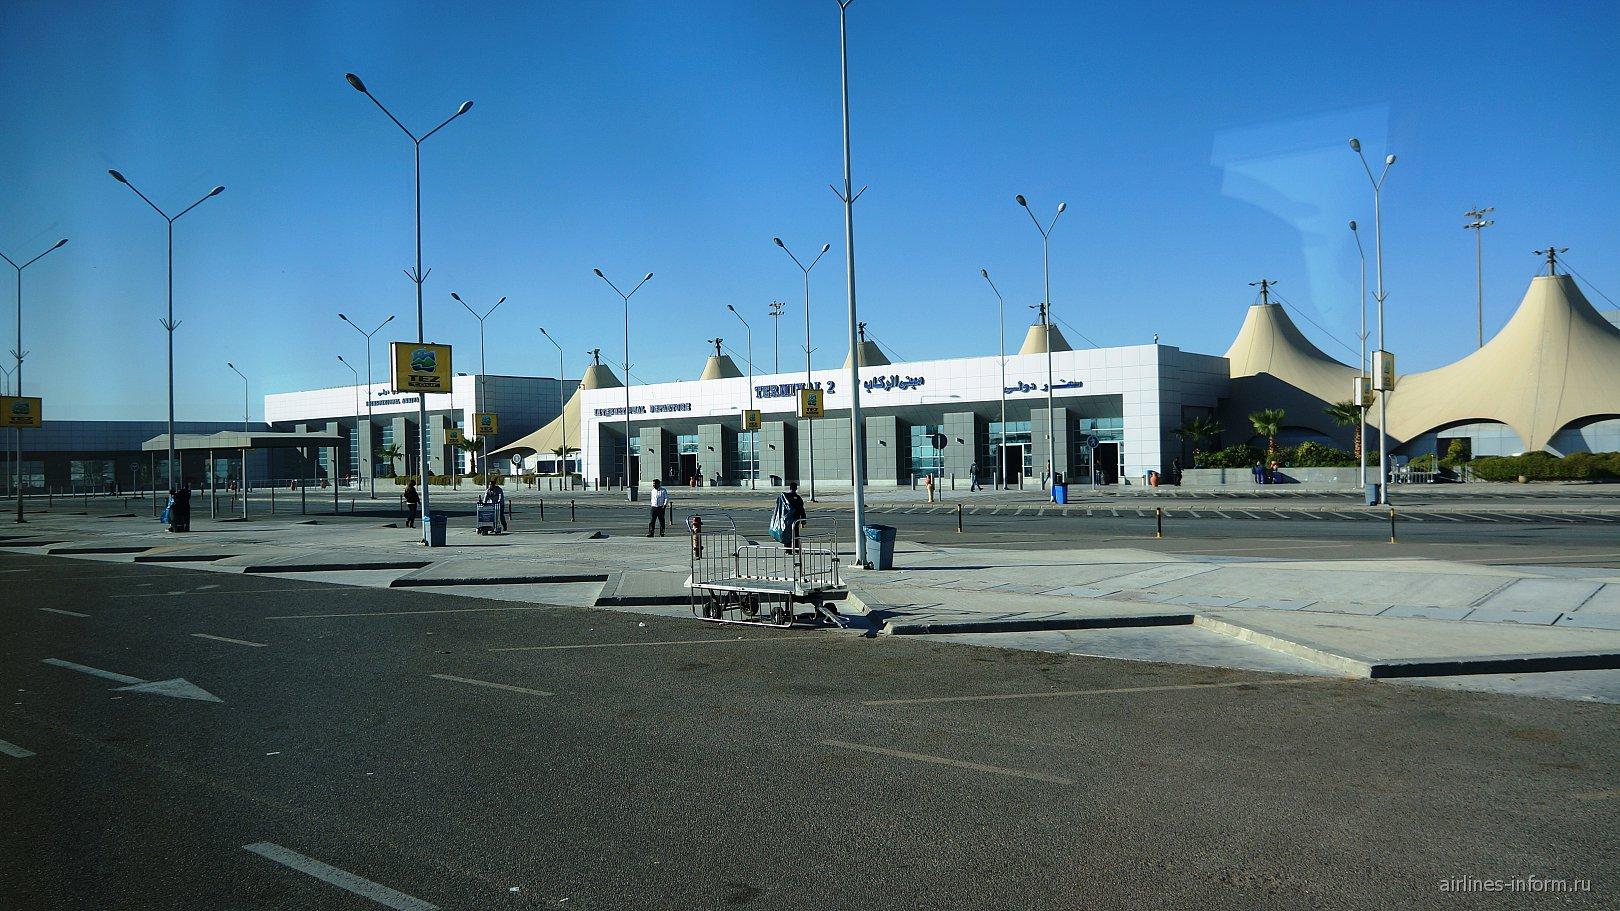 Пассажирский терминал 2 аэропорта Хургада